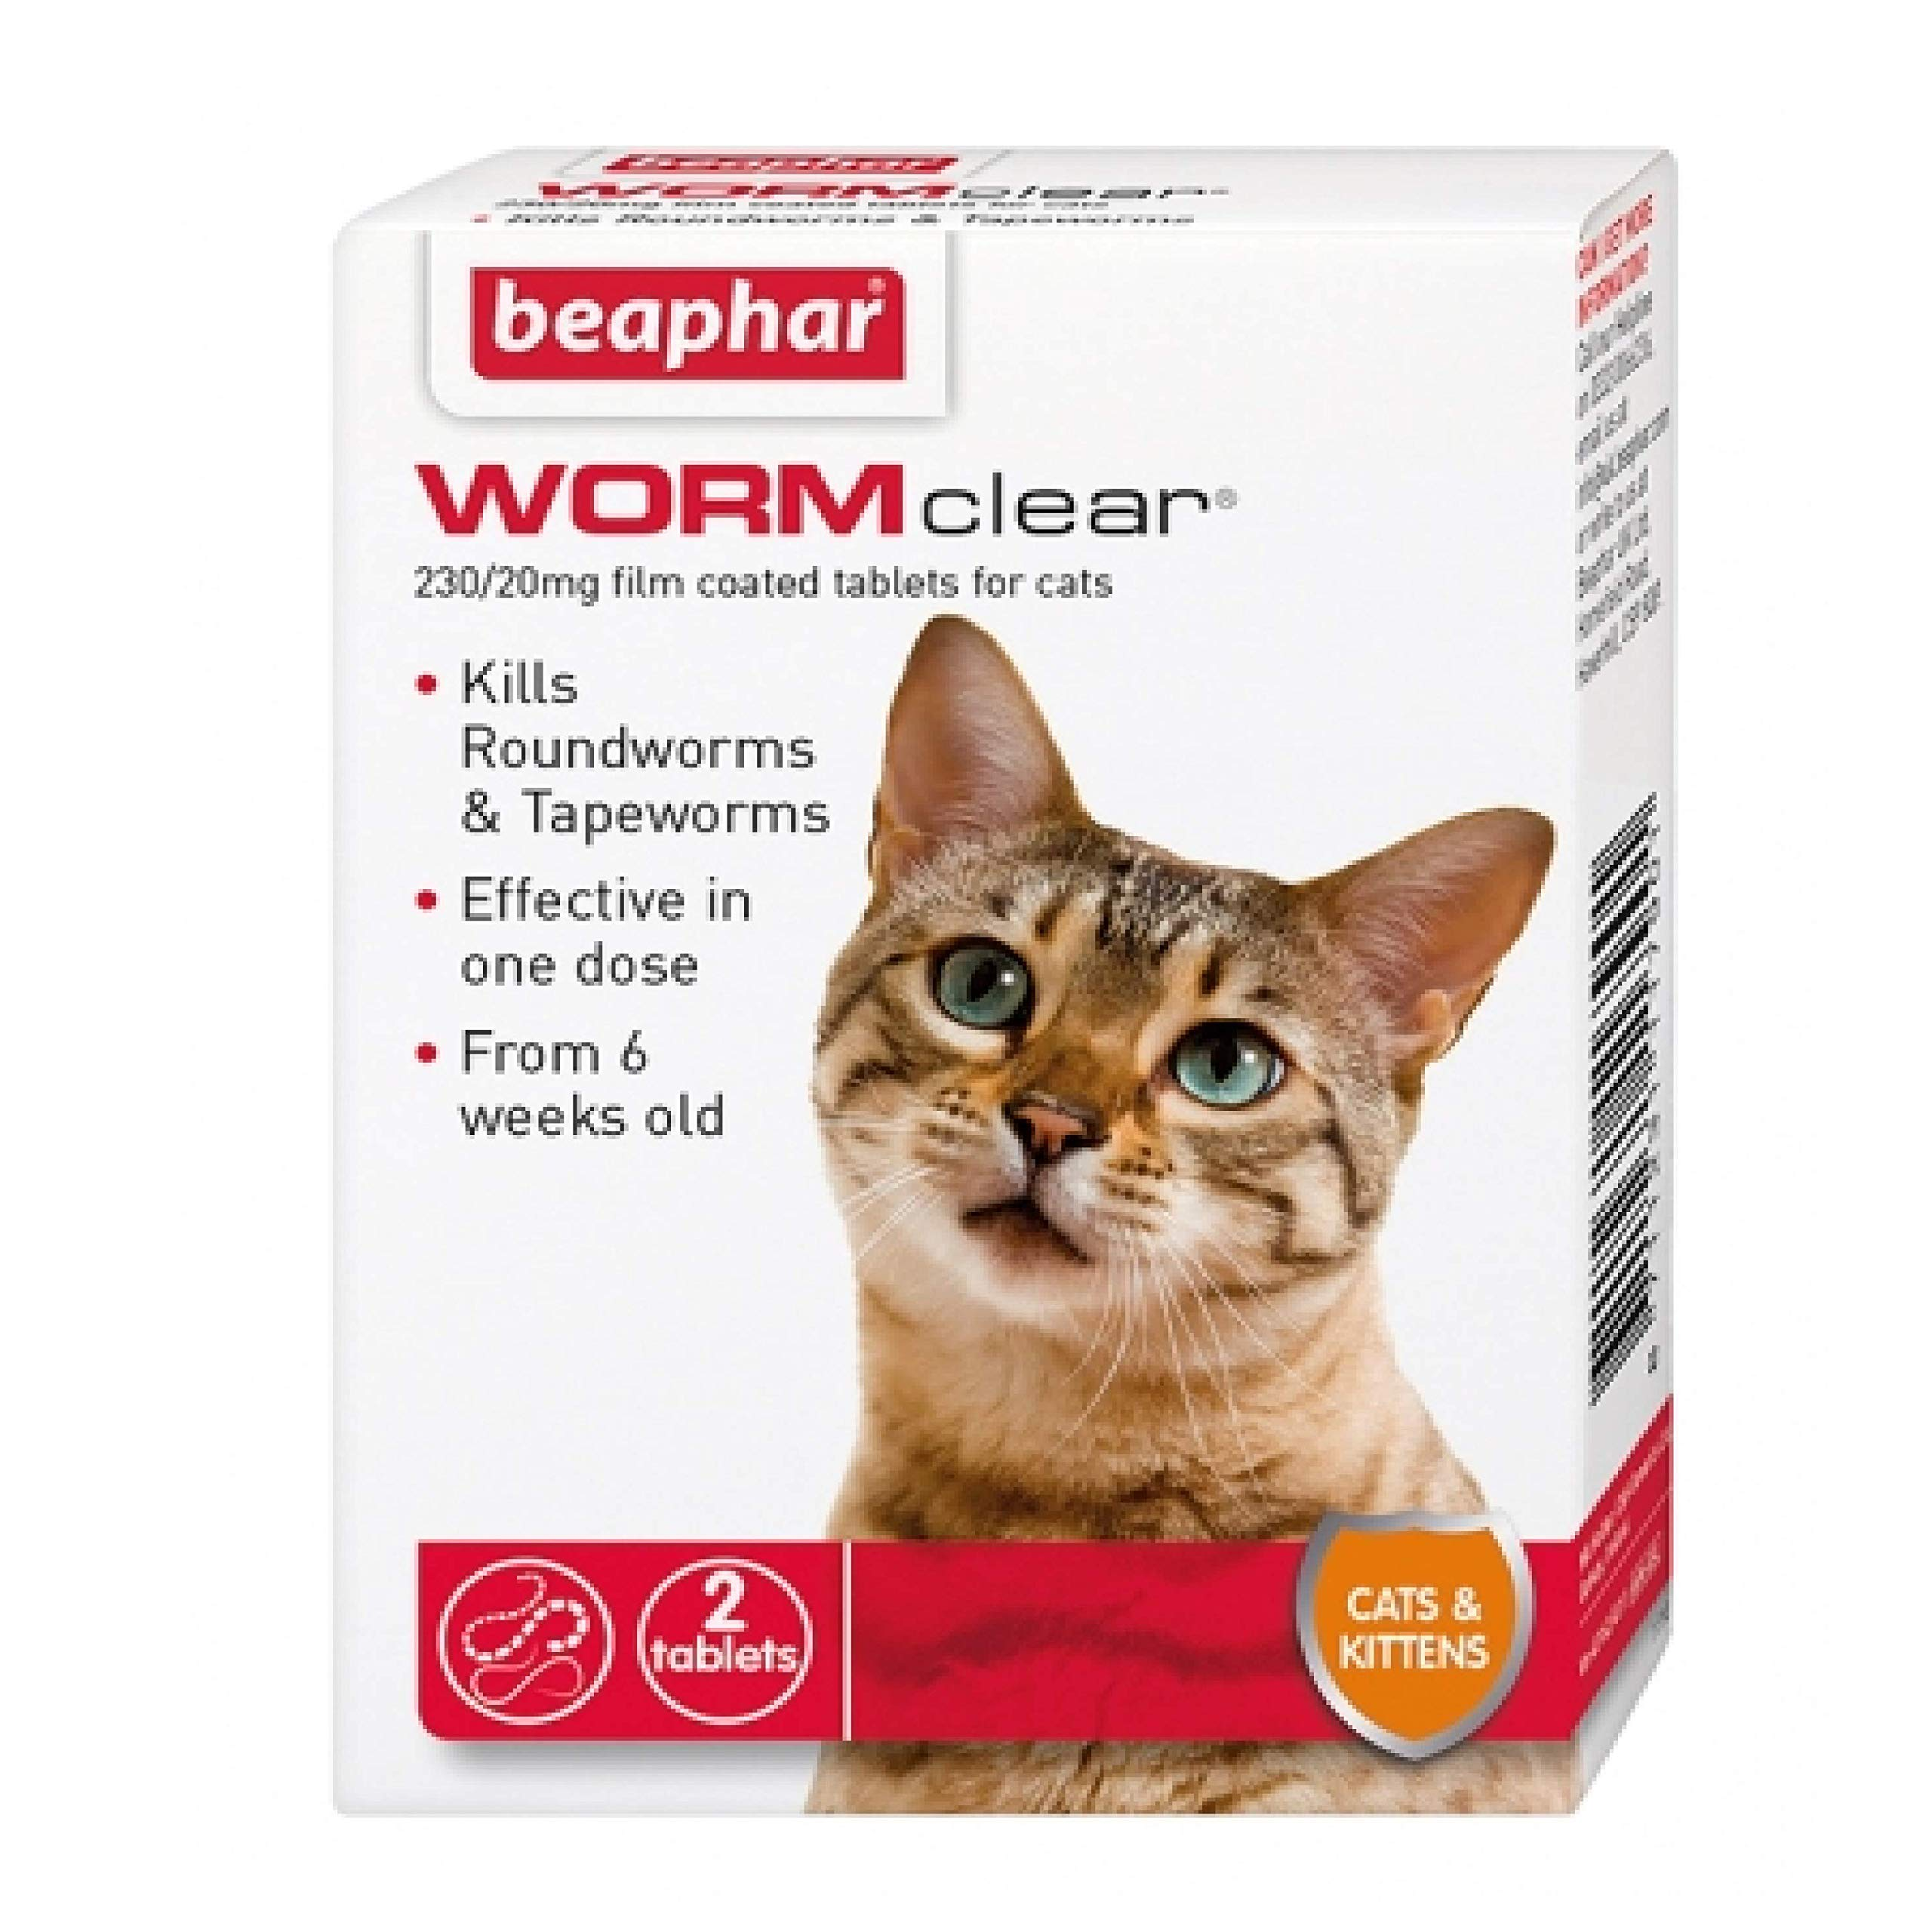 Leeway Beaphar – WORMclear – CATS & KITTENS – 2 TAB – ROUND & TAPE WORM x1